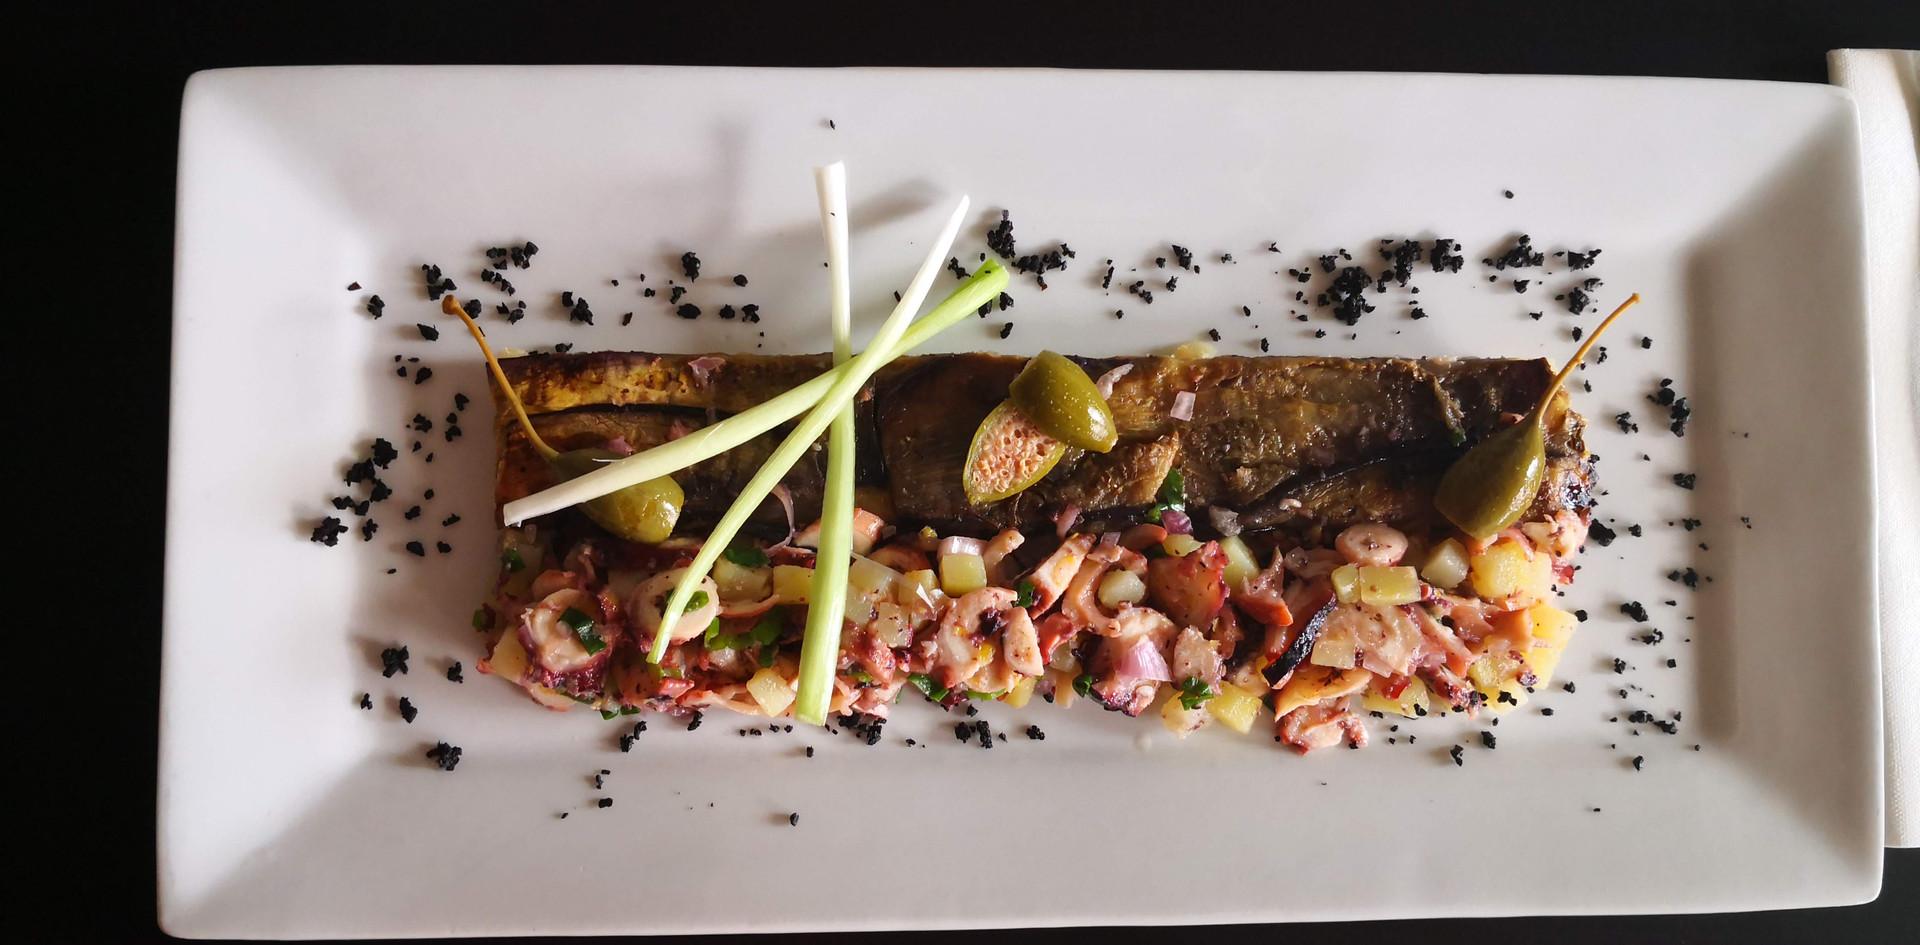 Salade de poulpe et tatin d'aubergine